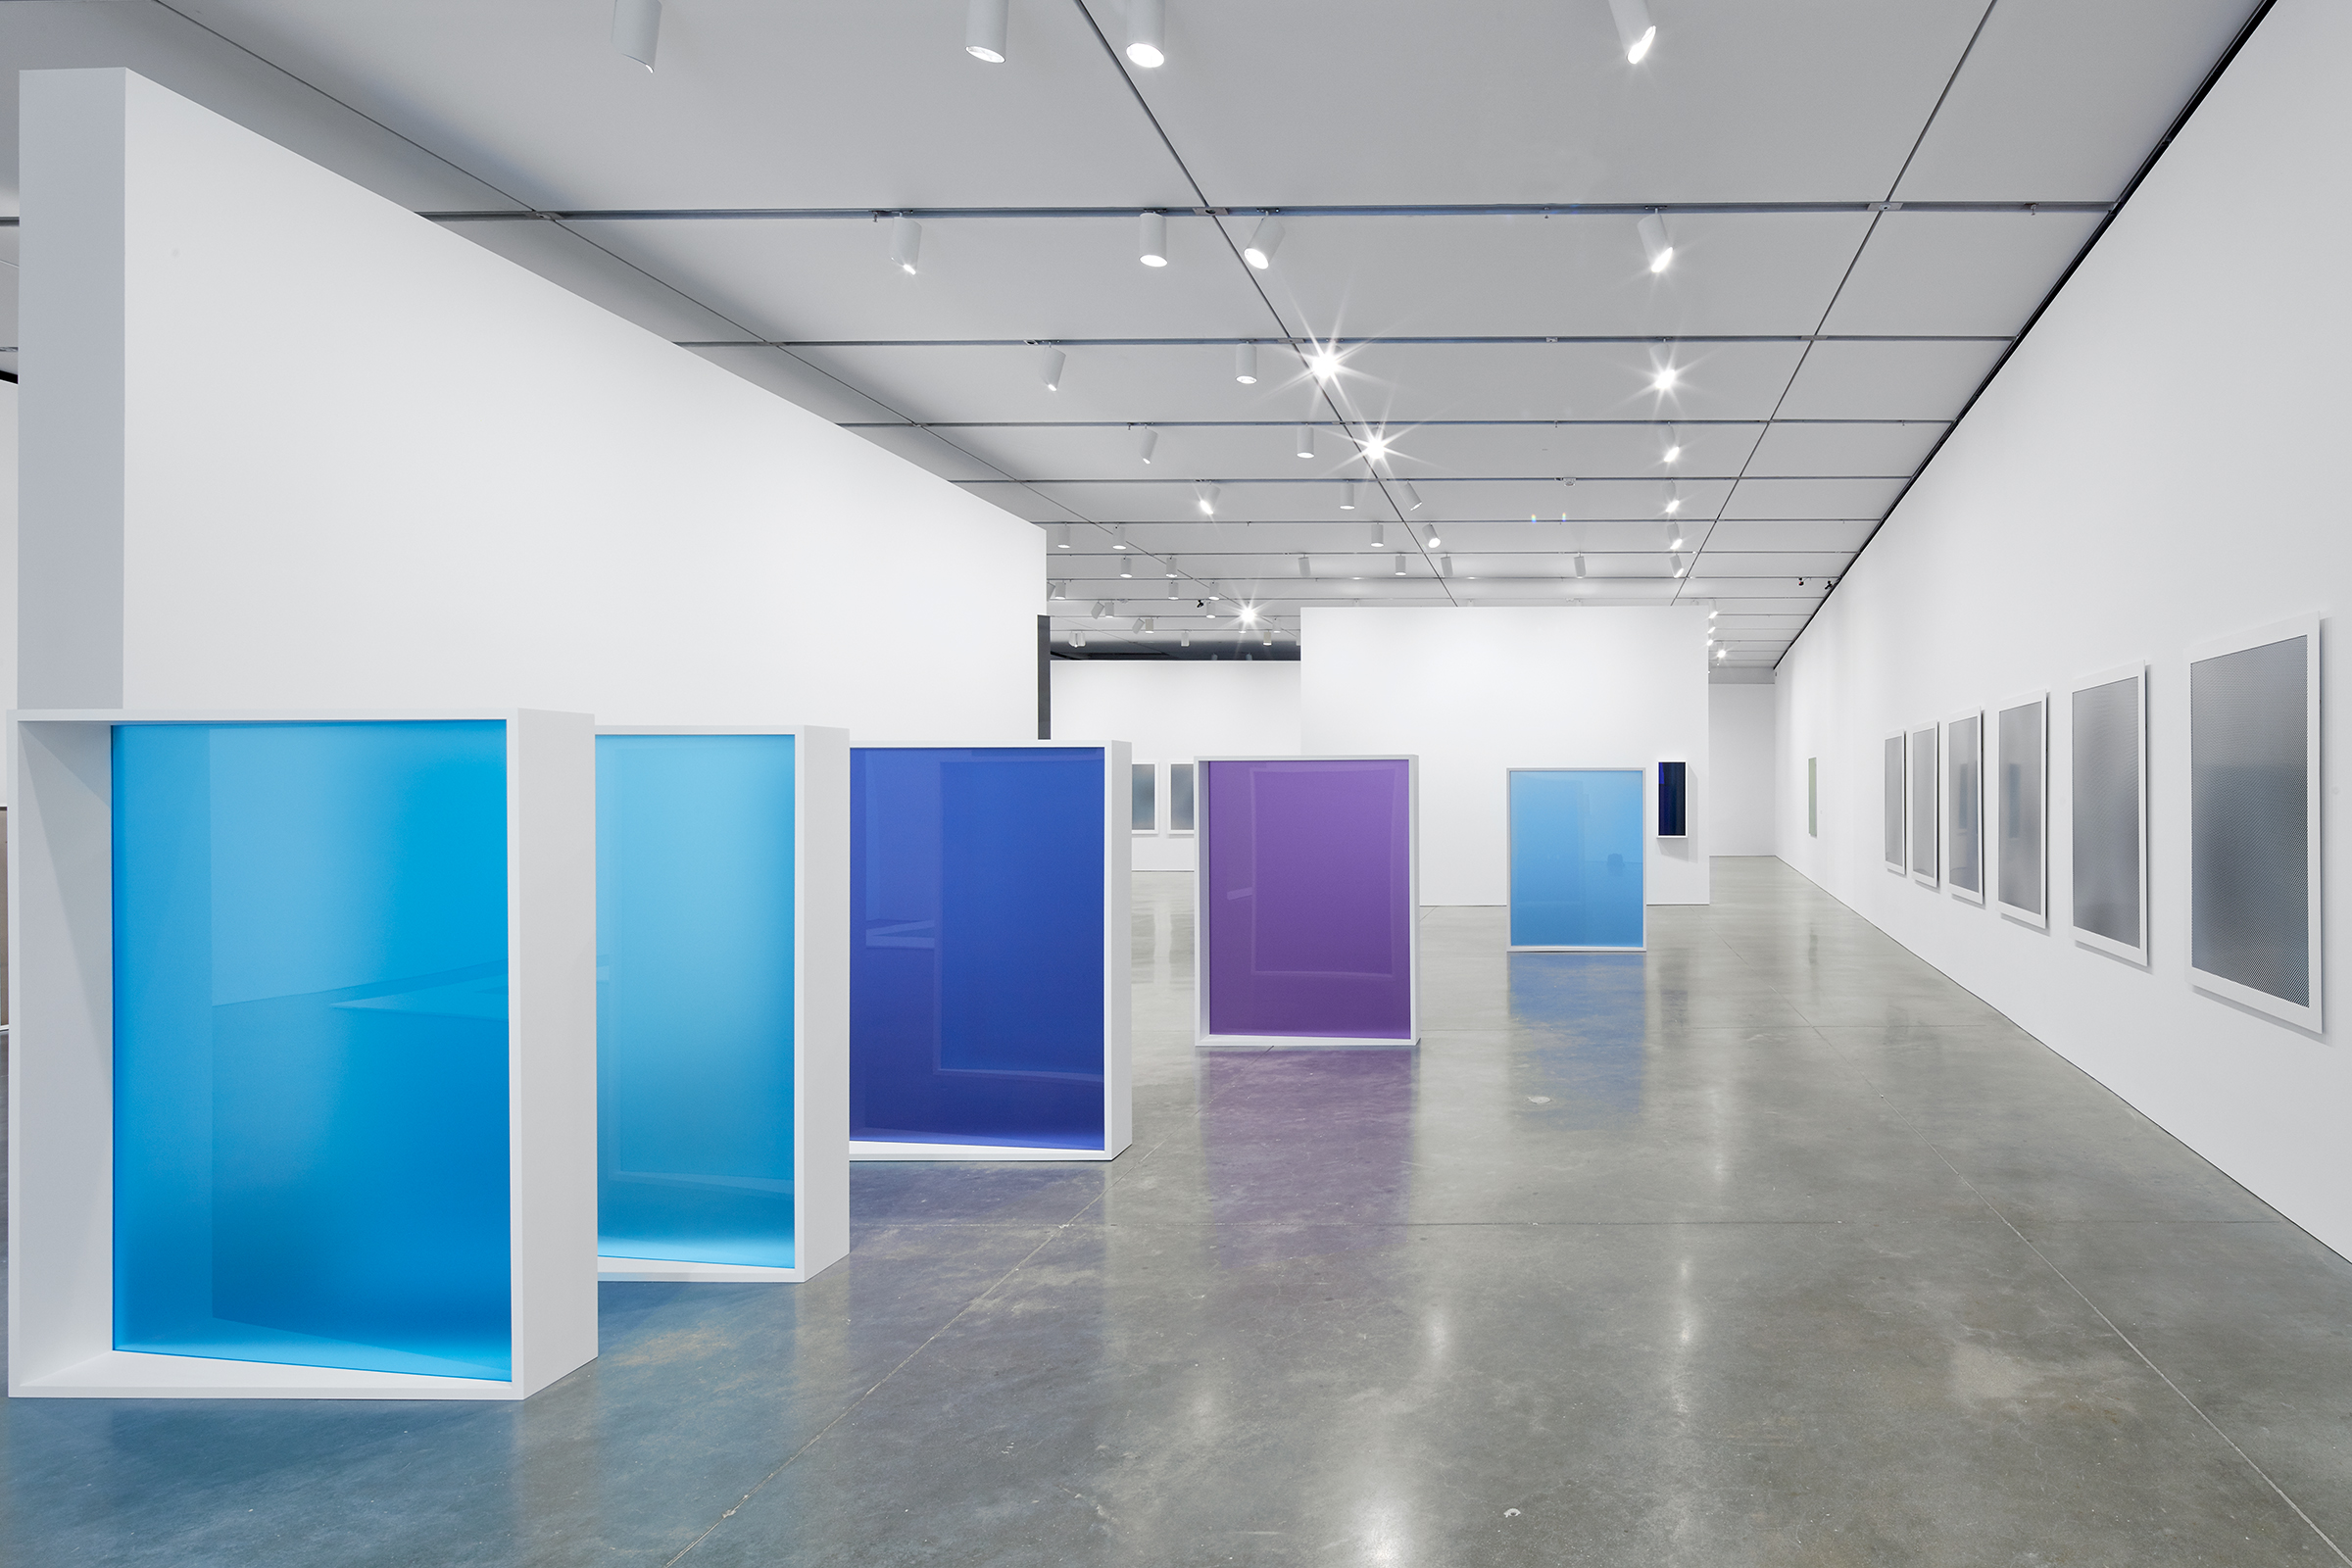 Gallery 4.1.1, 2015.Exhibition: Liz Deschenes, ICA Boston (June 29 - October 16, 2016). Photos courtesy the artist and Miguel Abreau Gallery, New York.